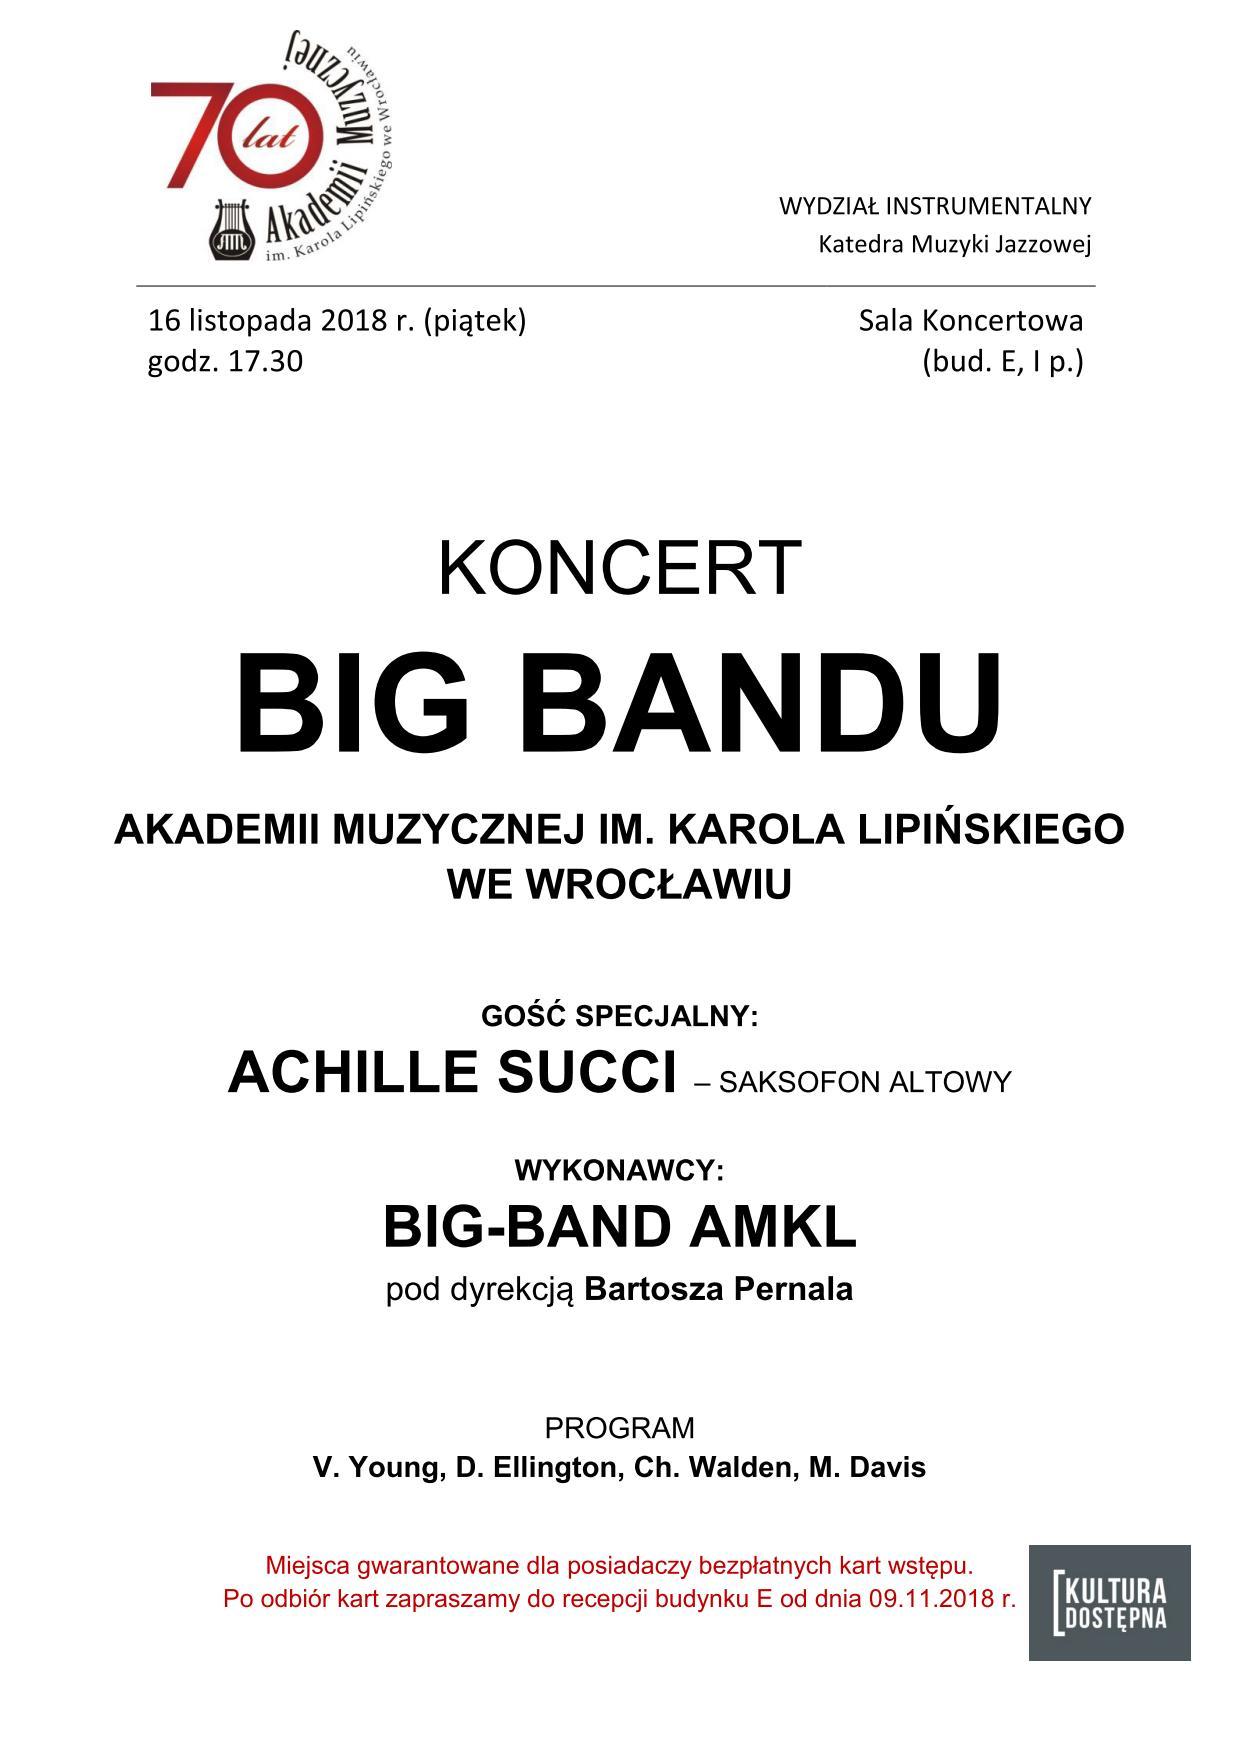 Koncert Big Bandu AMKL z Achille Succi